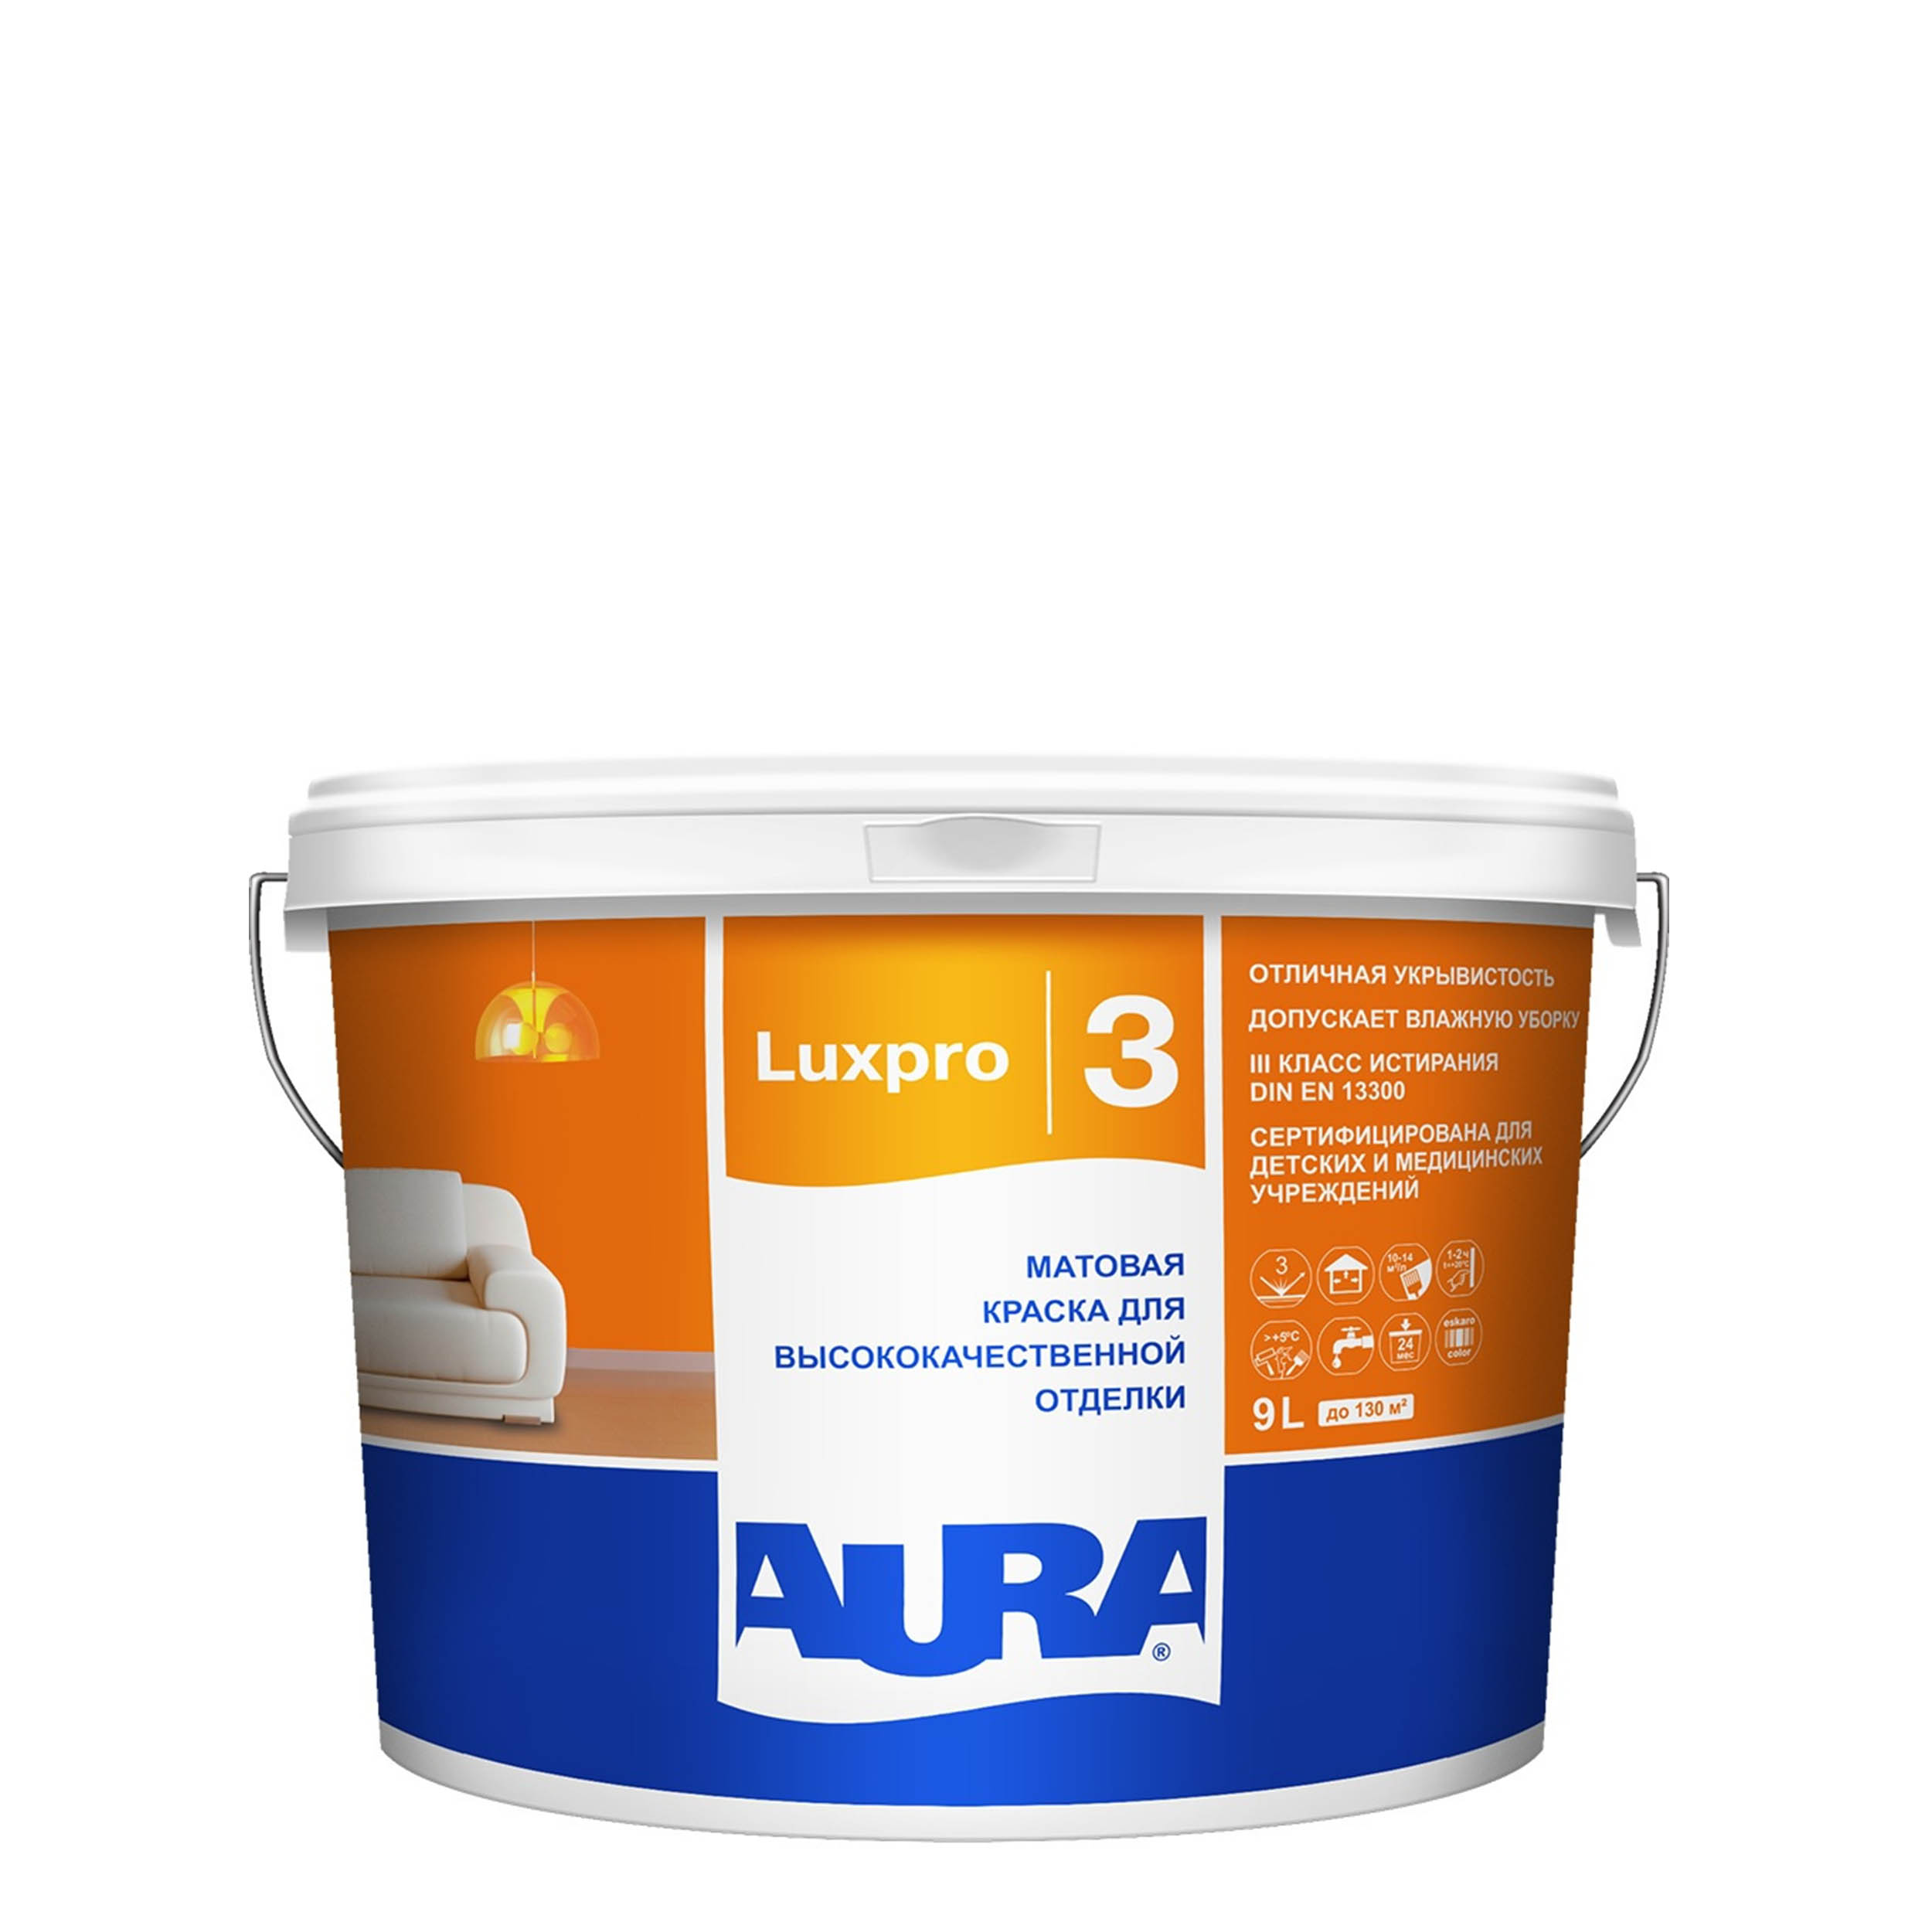 Фото 4 - Краска интерьерная, Aura LuxPRO 3, RAL 5017, 11 кг.